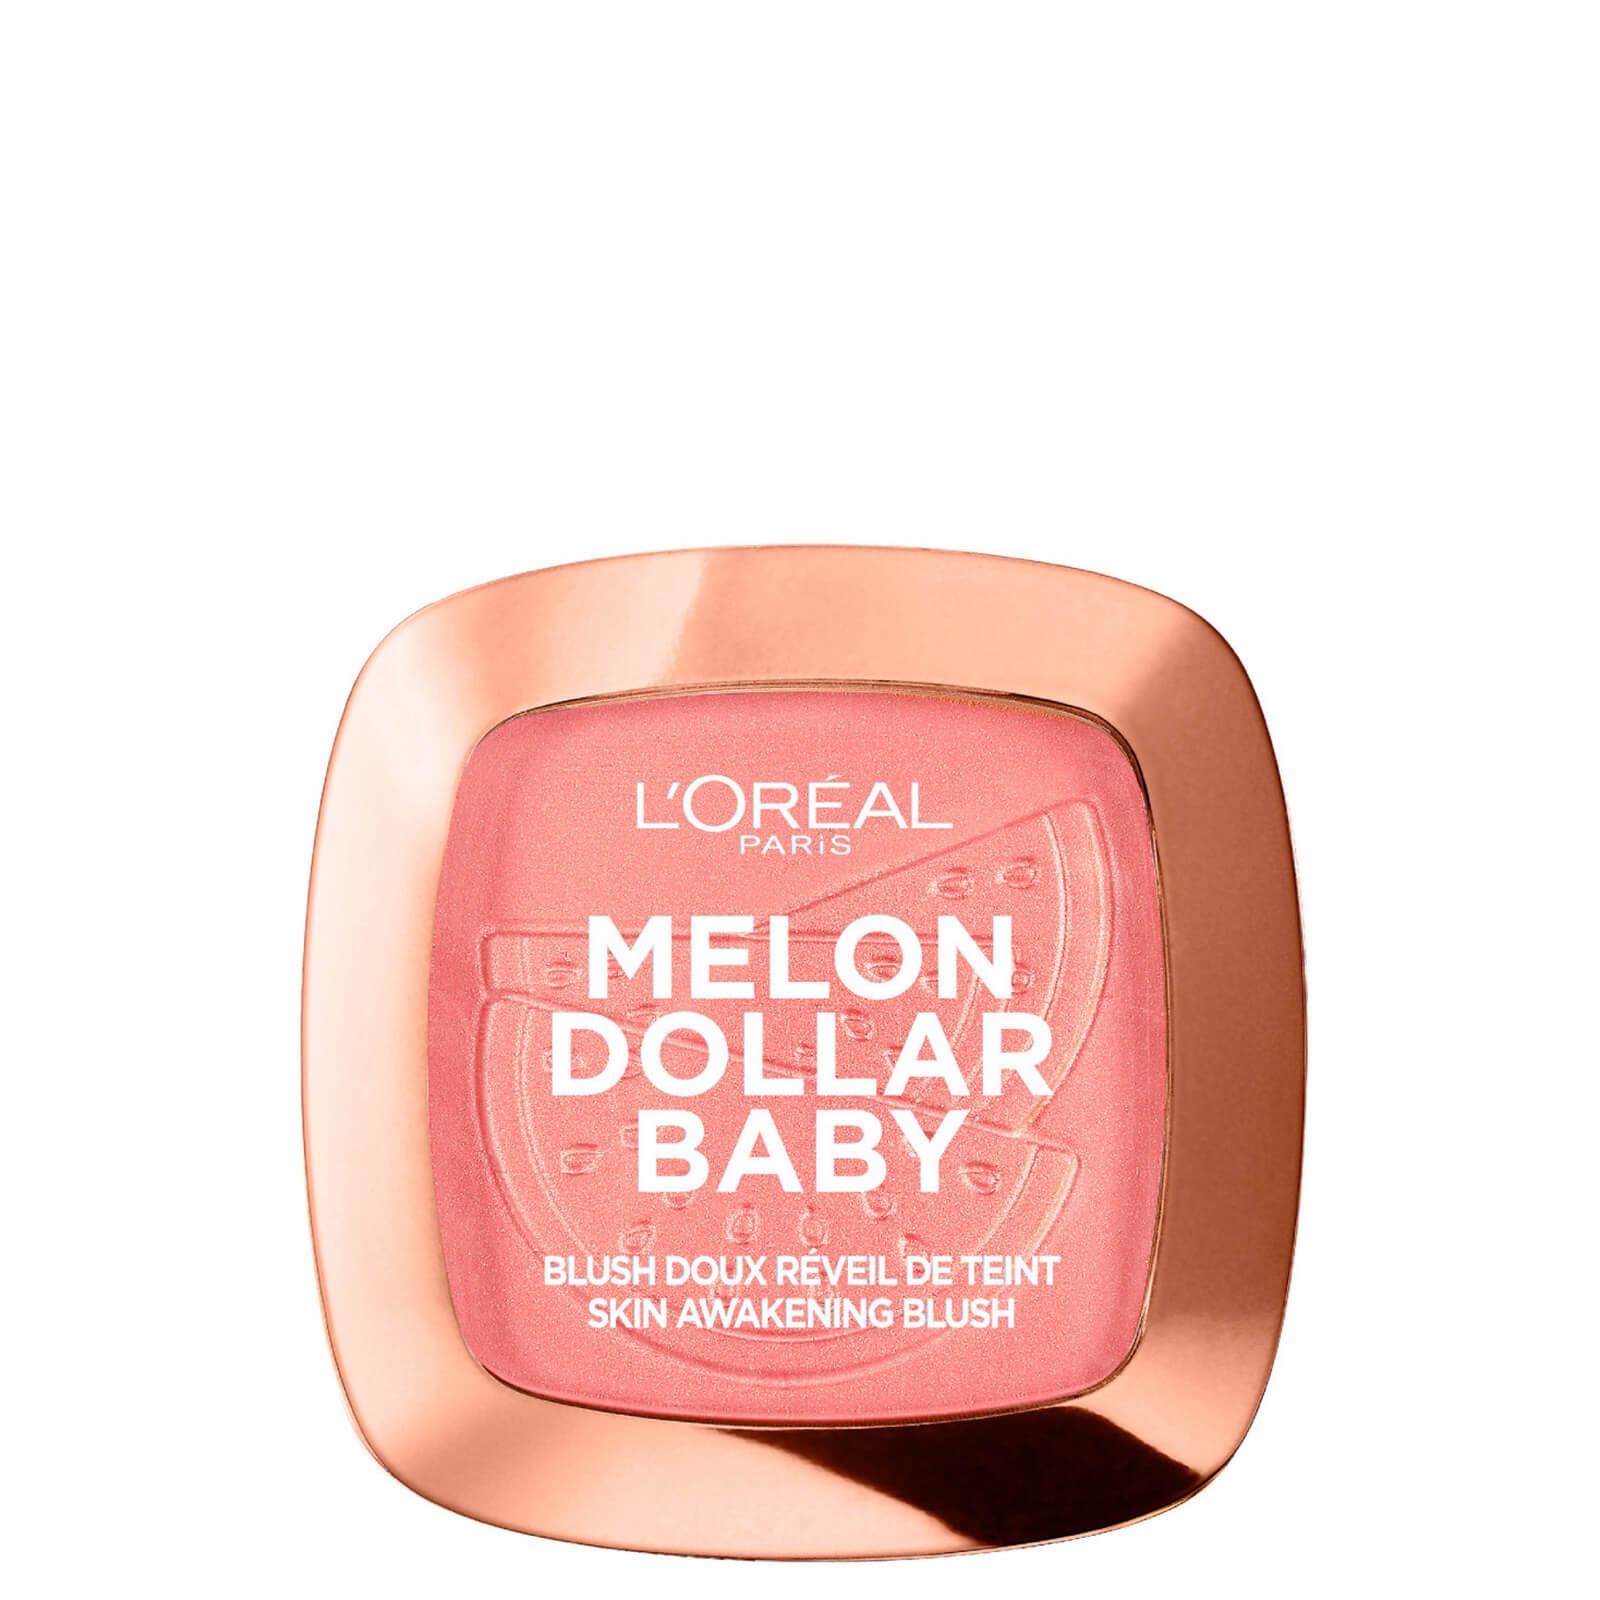 L'Oréal Paris Melon Dollar Baby Blush 03 Watermelon Addict